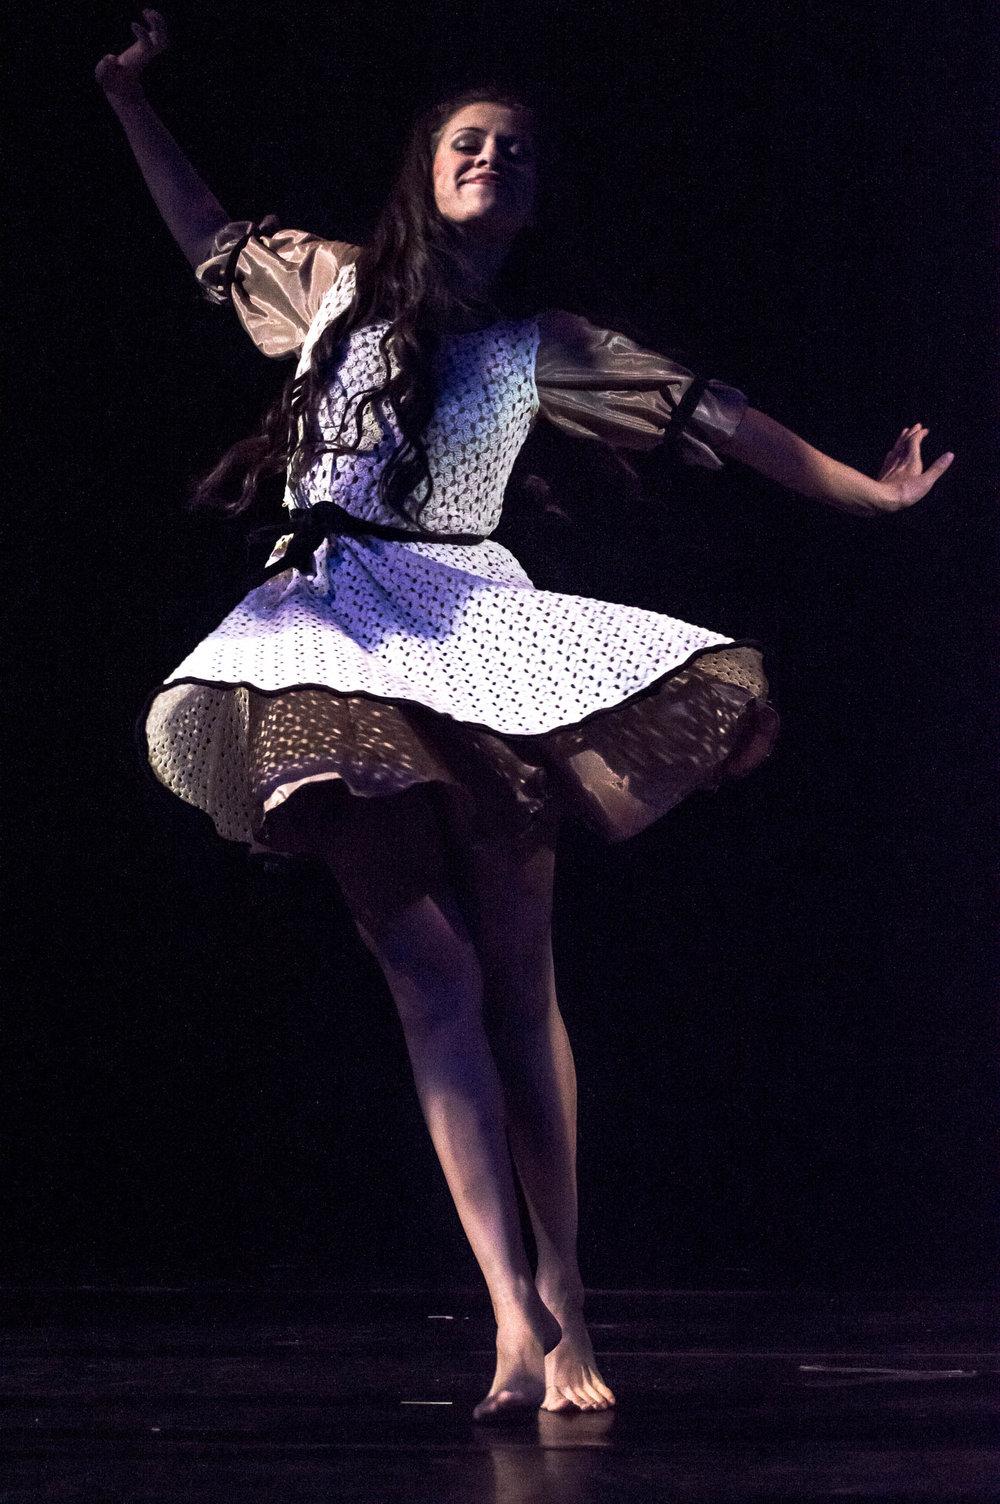 CaZo Dance Co - Asylum - Phx Ctr Arts - Achristodoulou-11.jpg